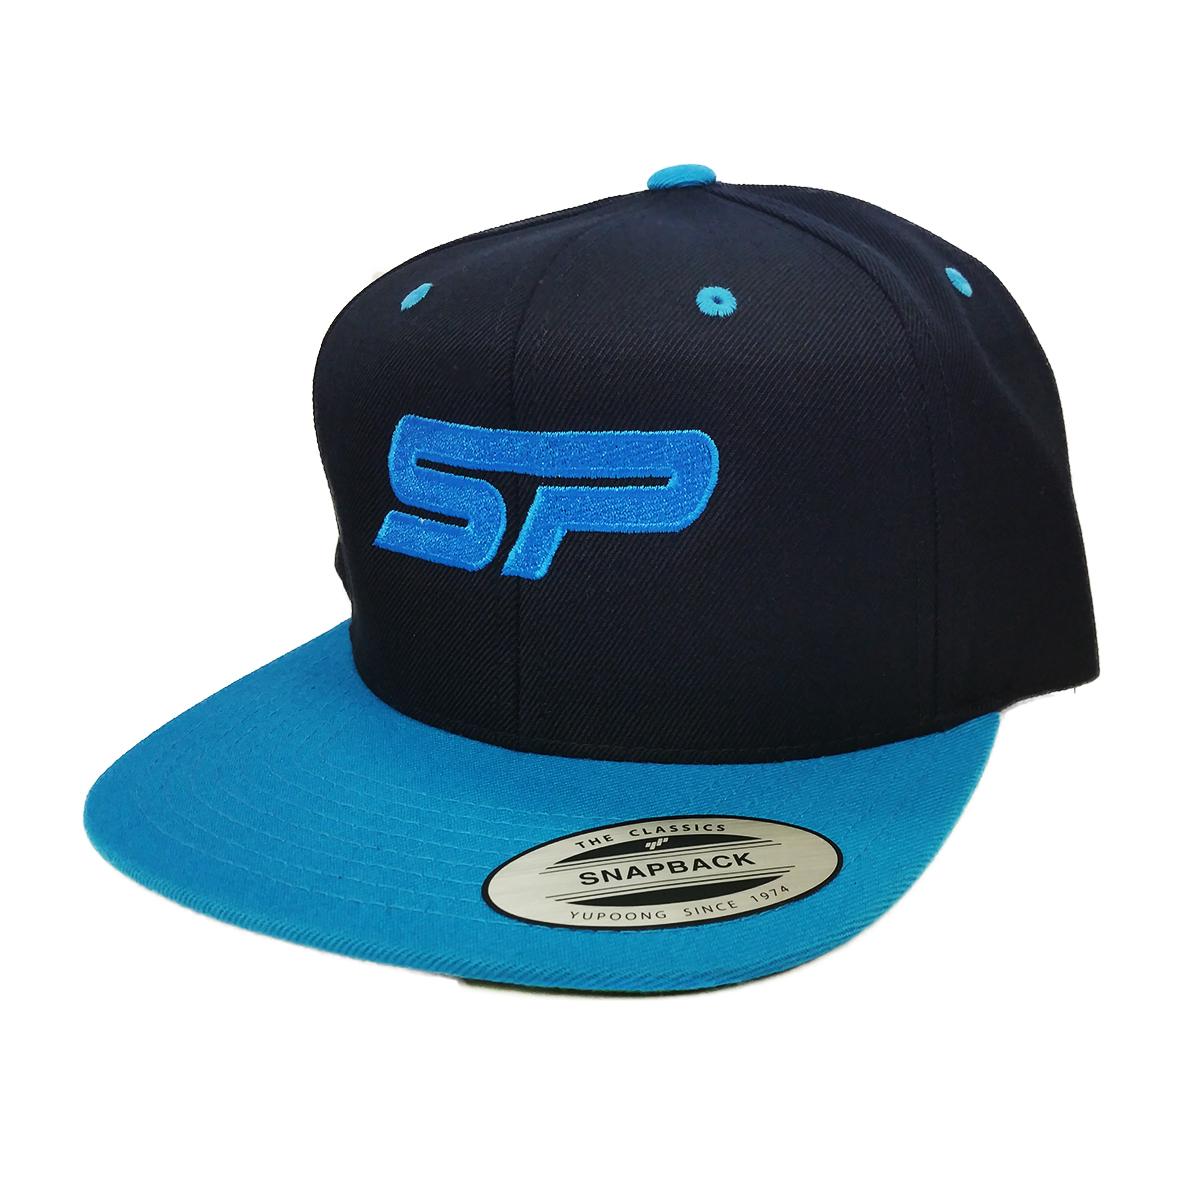 ... ireland new york yankees hats yankees baseball caps fansedge 8679a 03ca7 dd7b24c4f565